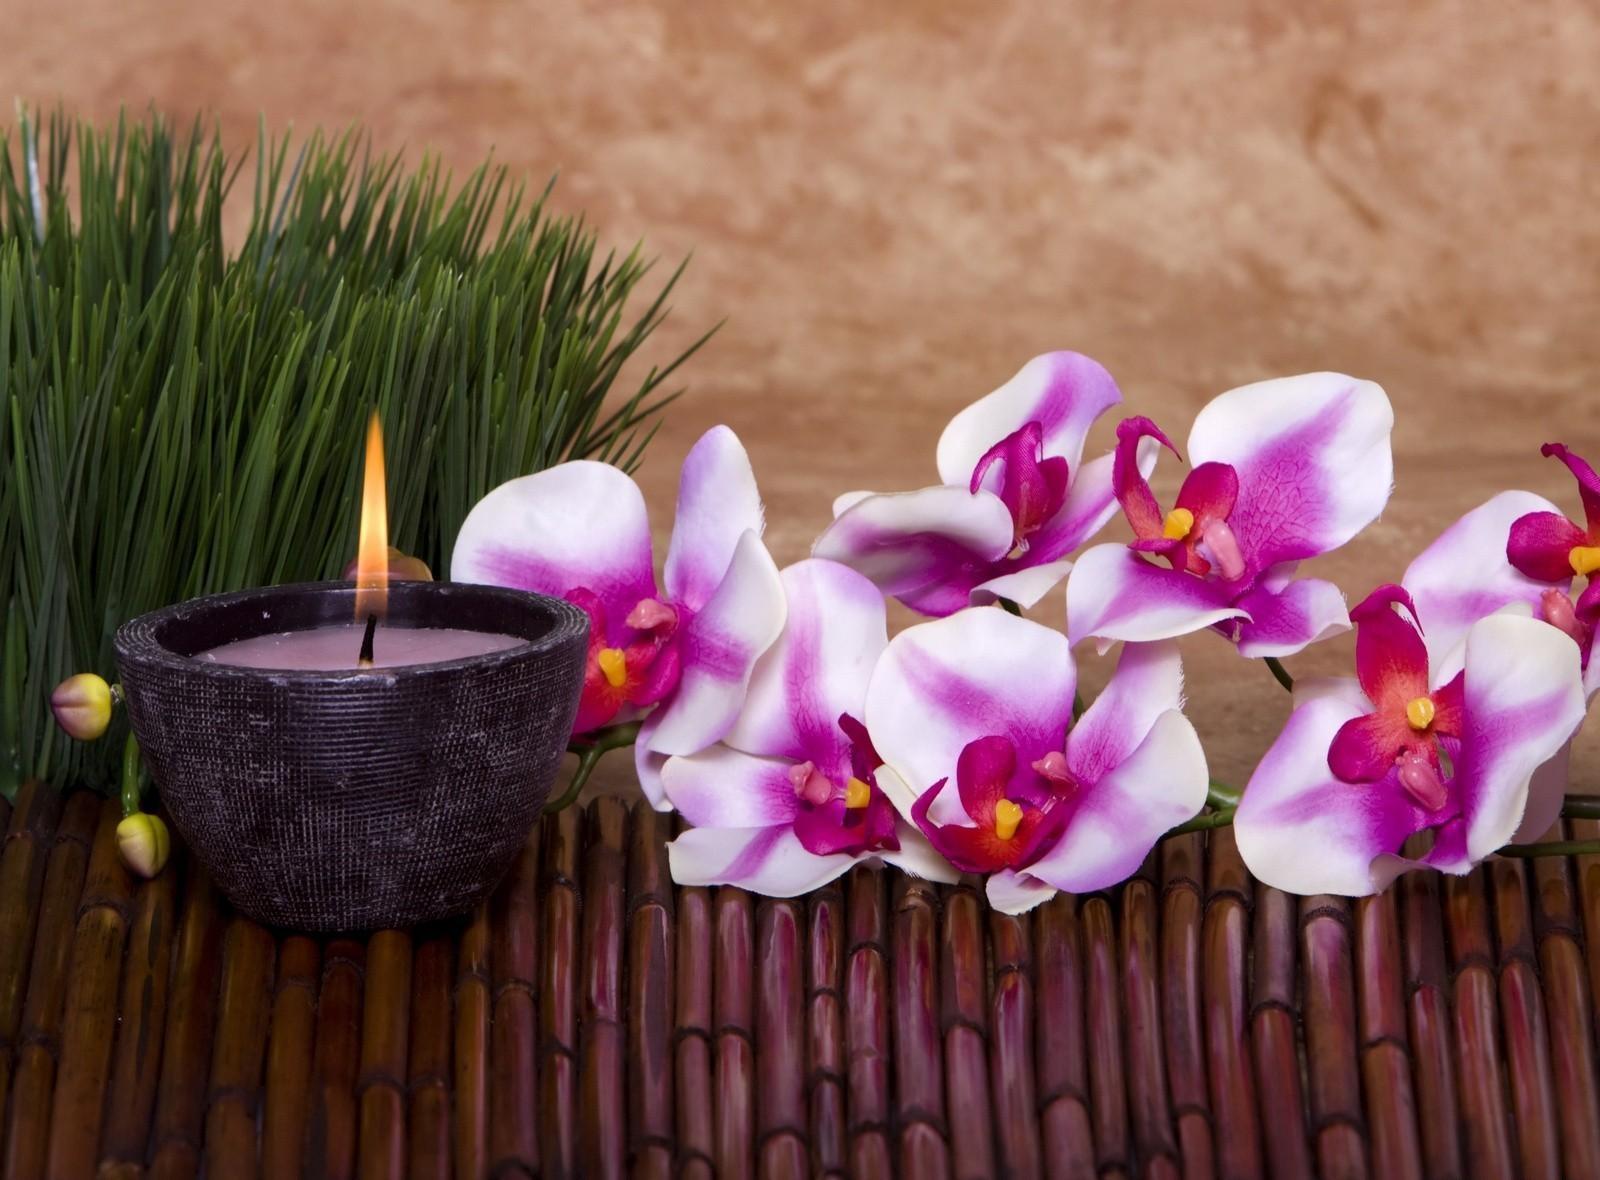 Fond D Ecran Orchidee Fleur Bougie Herbe Bambou 1600x1180 Coolwallpapers 685598 Fond D Ecran Wallhere